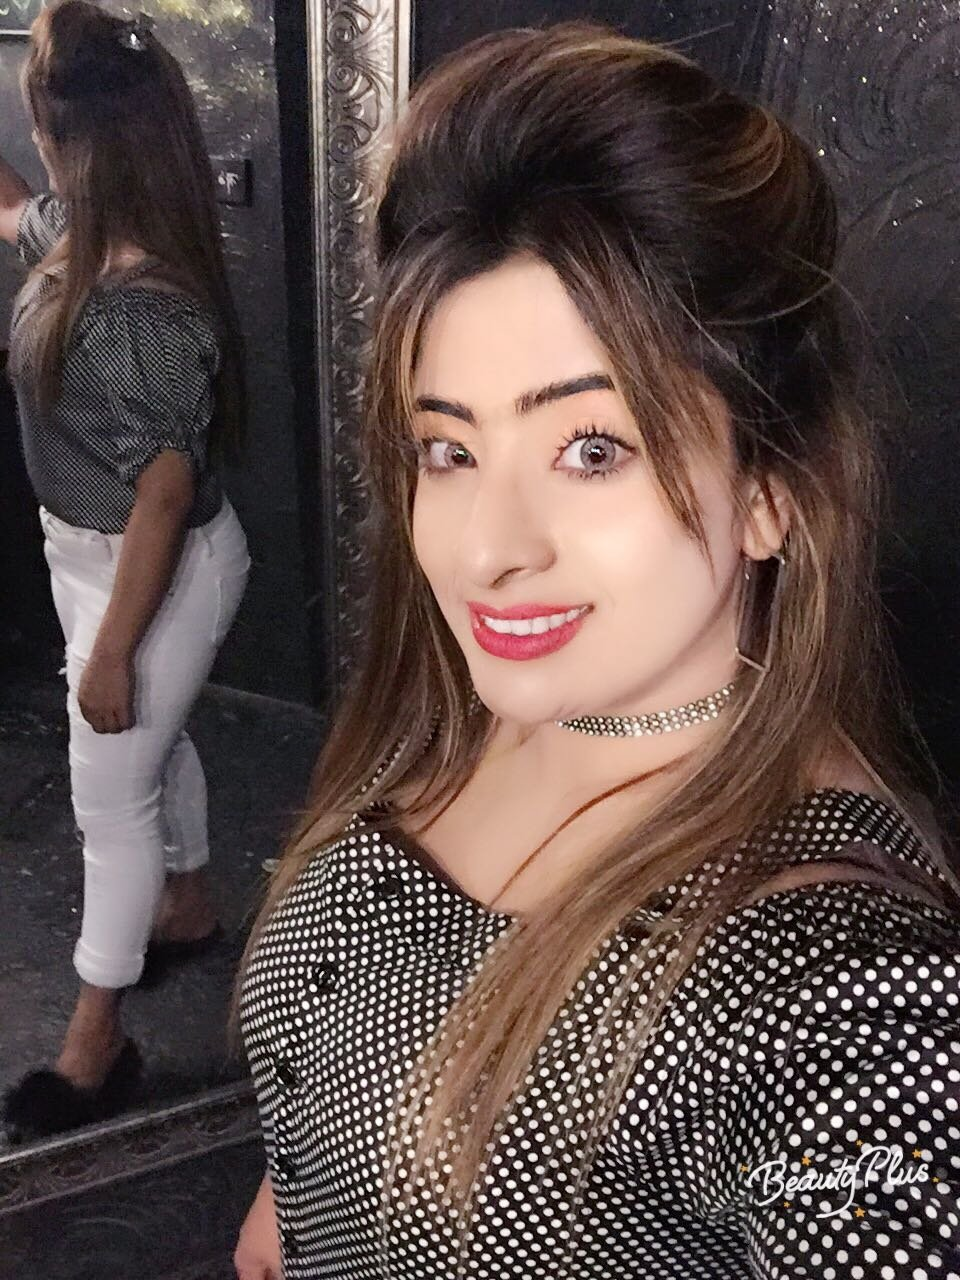 MALINDA: Hot Lesbian Girls Stuffing Their Pussies